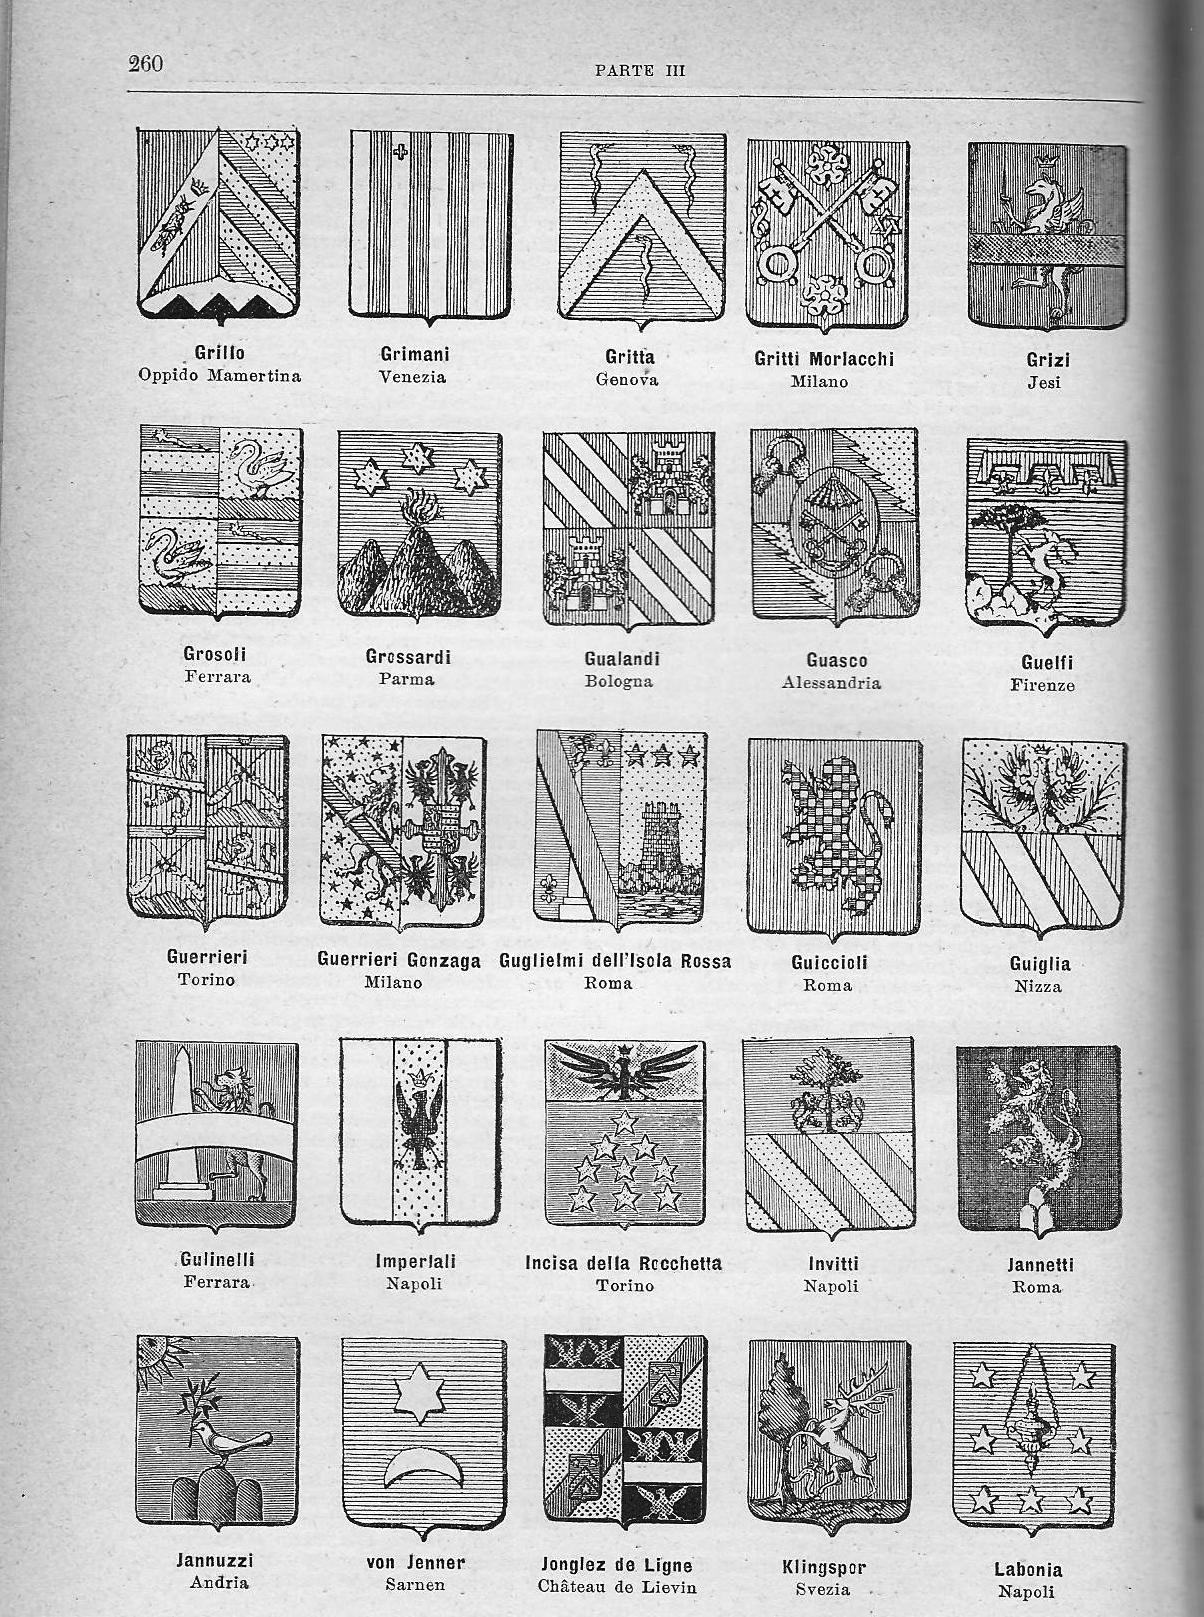 Calendario 1900.File Calendario D Oro 1900 Pagina 260 Jpg Wikimedia Commons